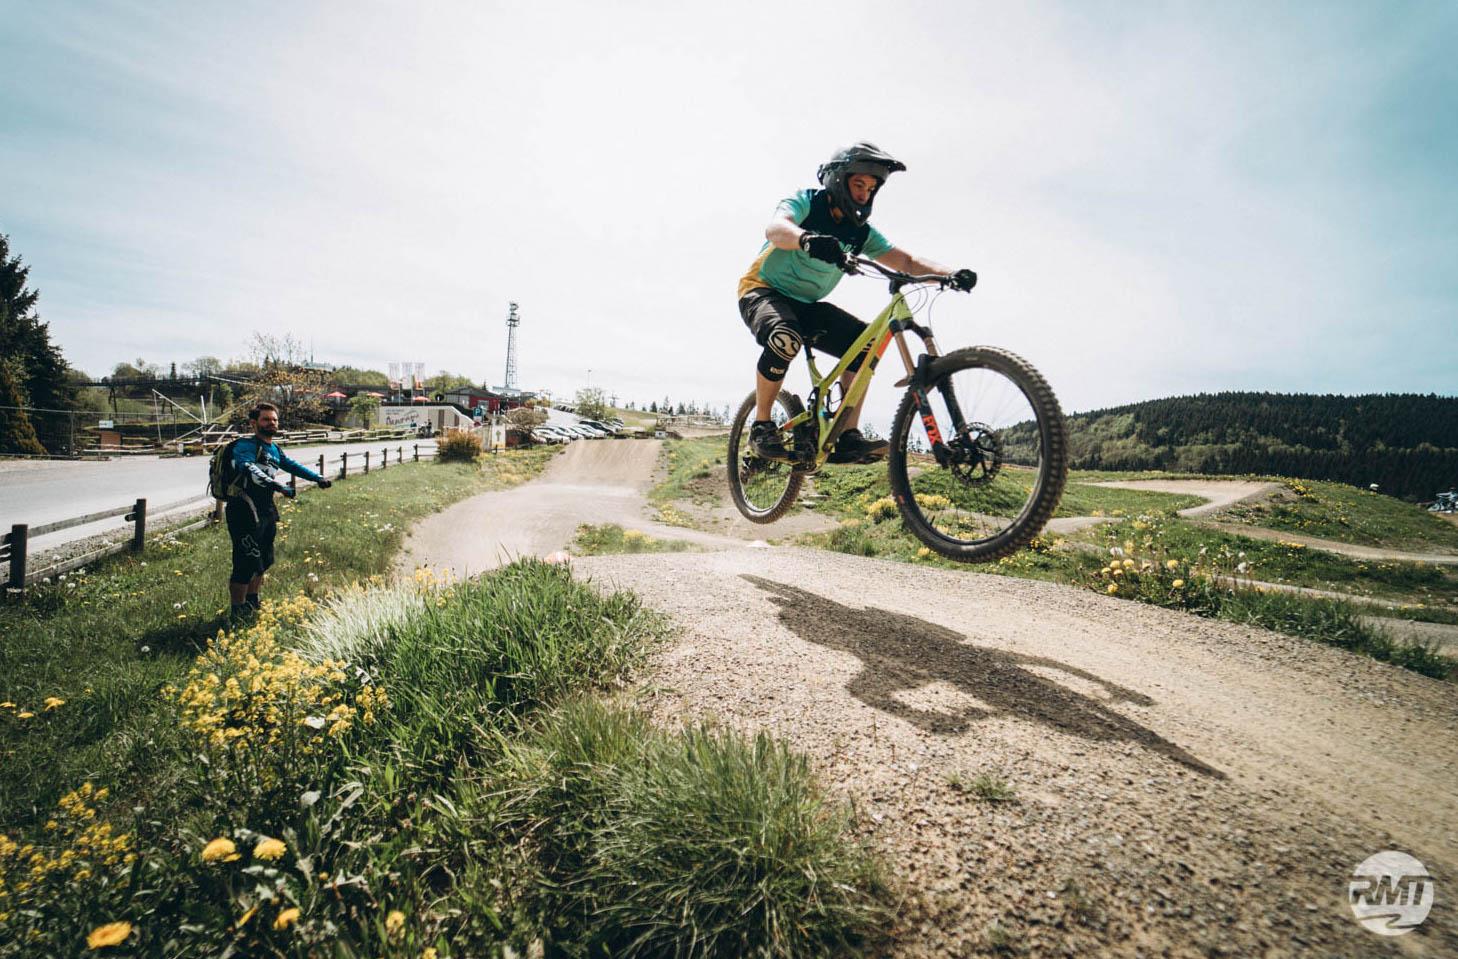 MTB Sprung & Drop Kurs in Pforzheim - Fahrtechnik Training Rock my Trail Bikeschule -